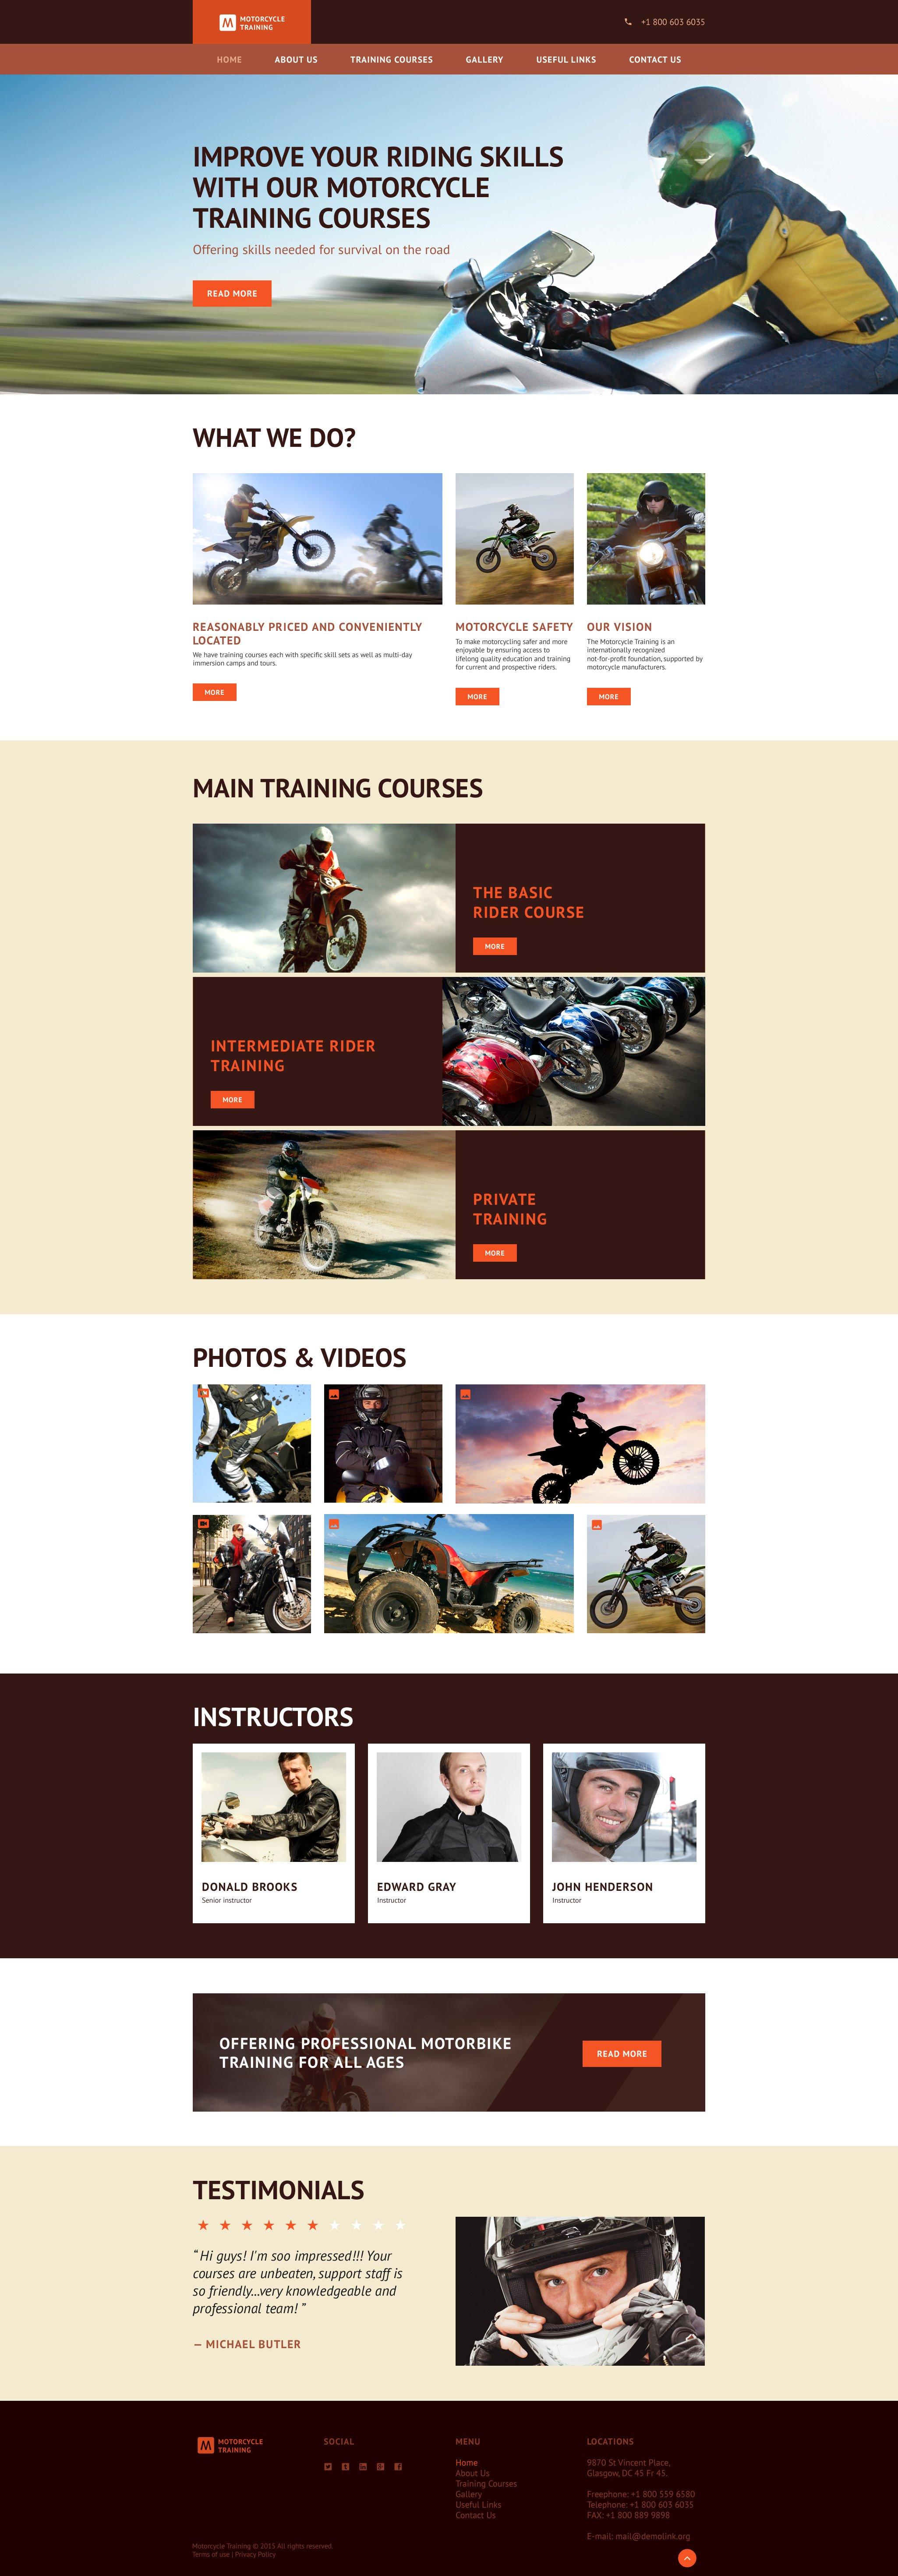 """Motorcycle Training"" - адаптивний Шаблон сайту №55948 - скріншот"